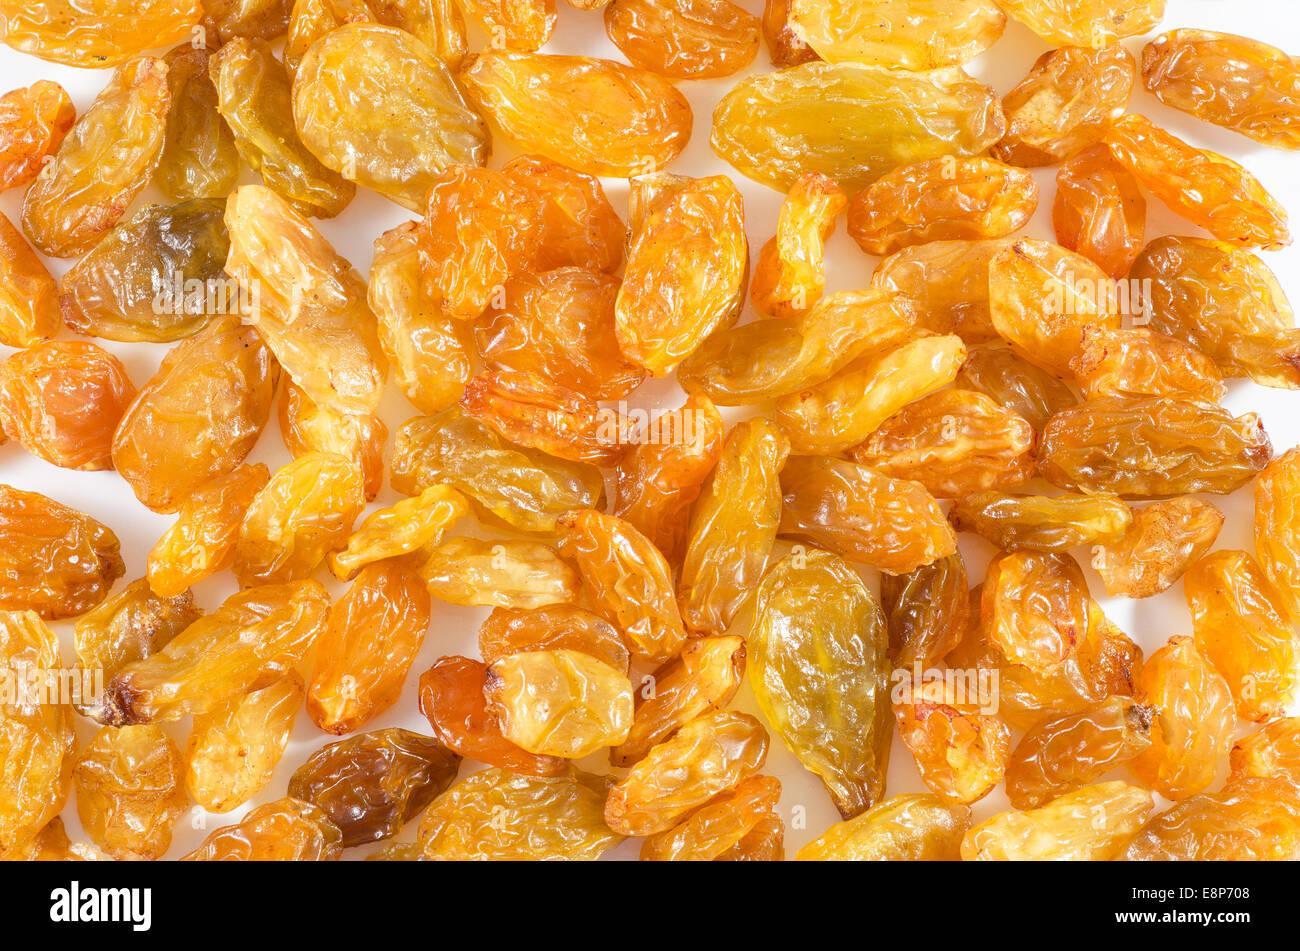 Dried raisins isolated on white background - Stock Image